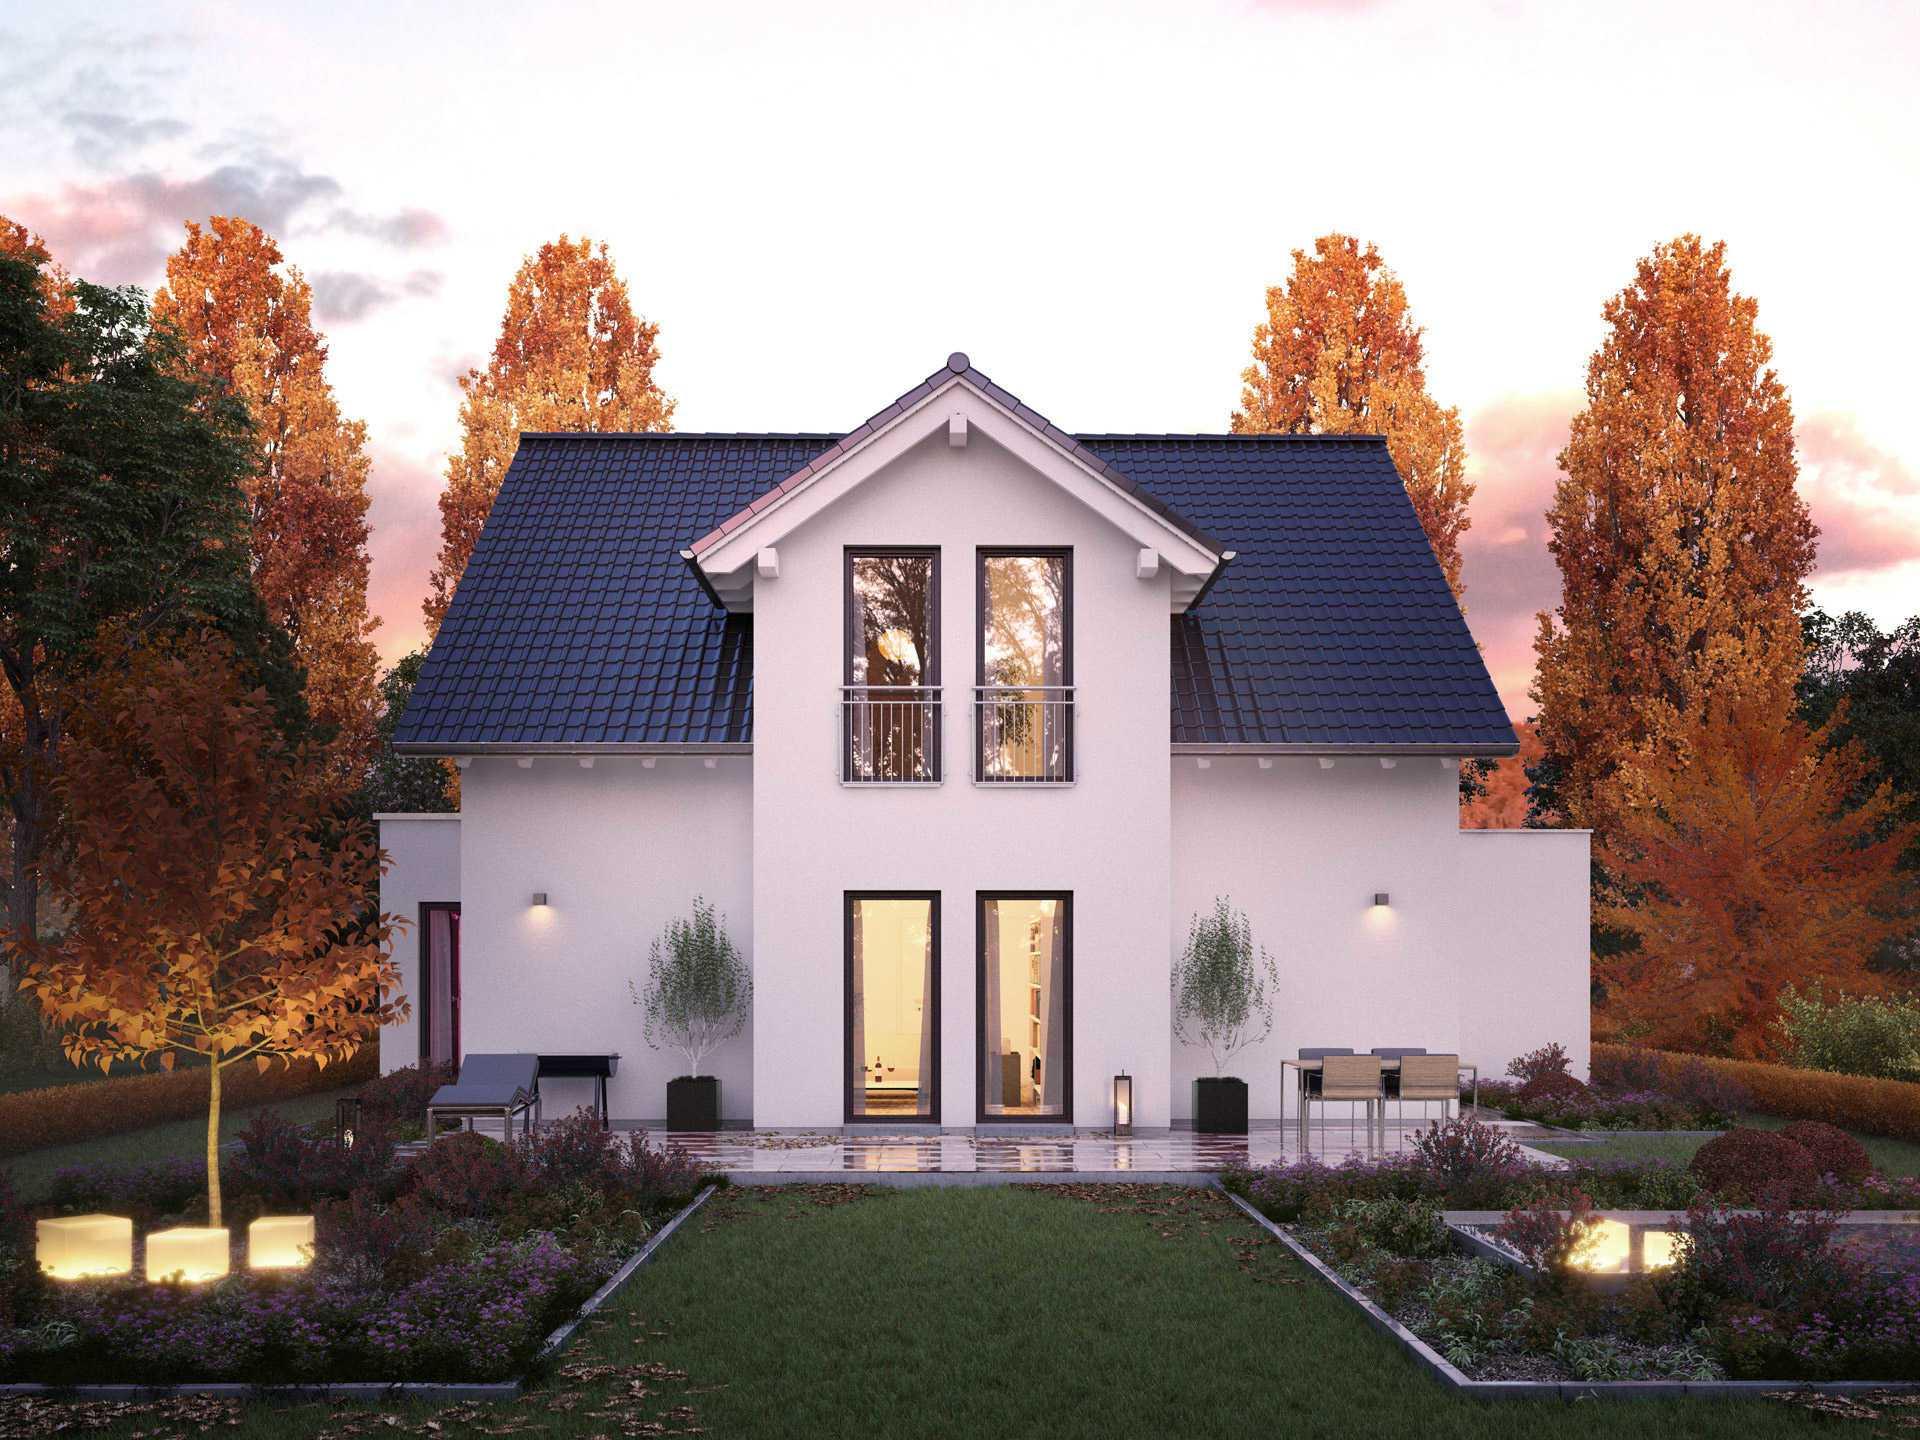 einfamilienhaus lifestyle 2 massa haus. Black Bedroom Furniture Sets. Home Design Ideas